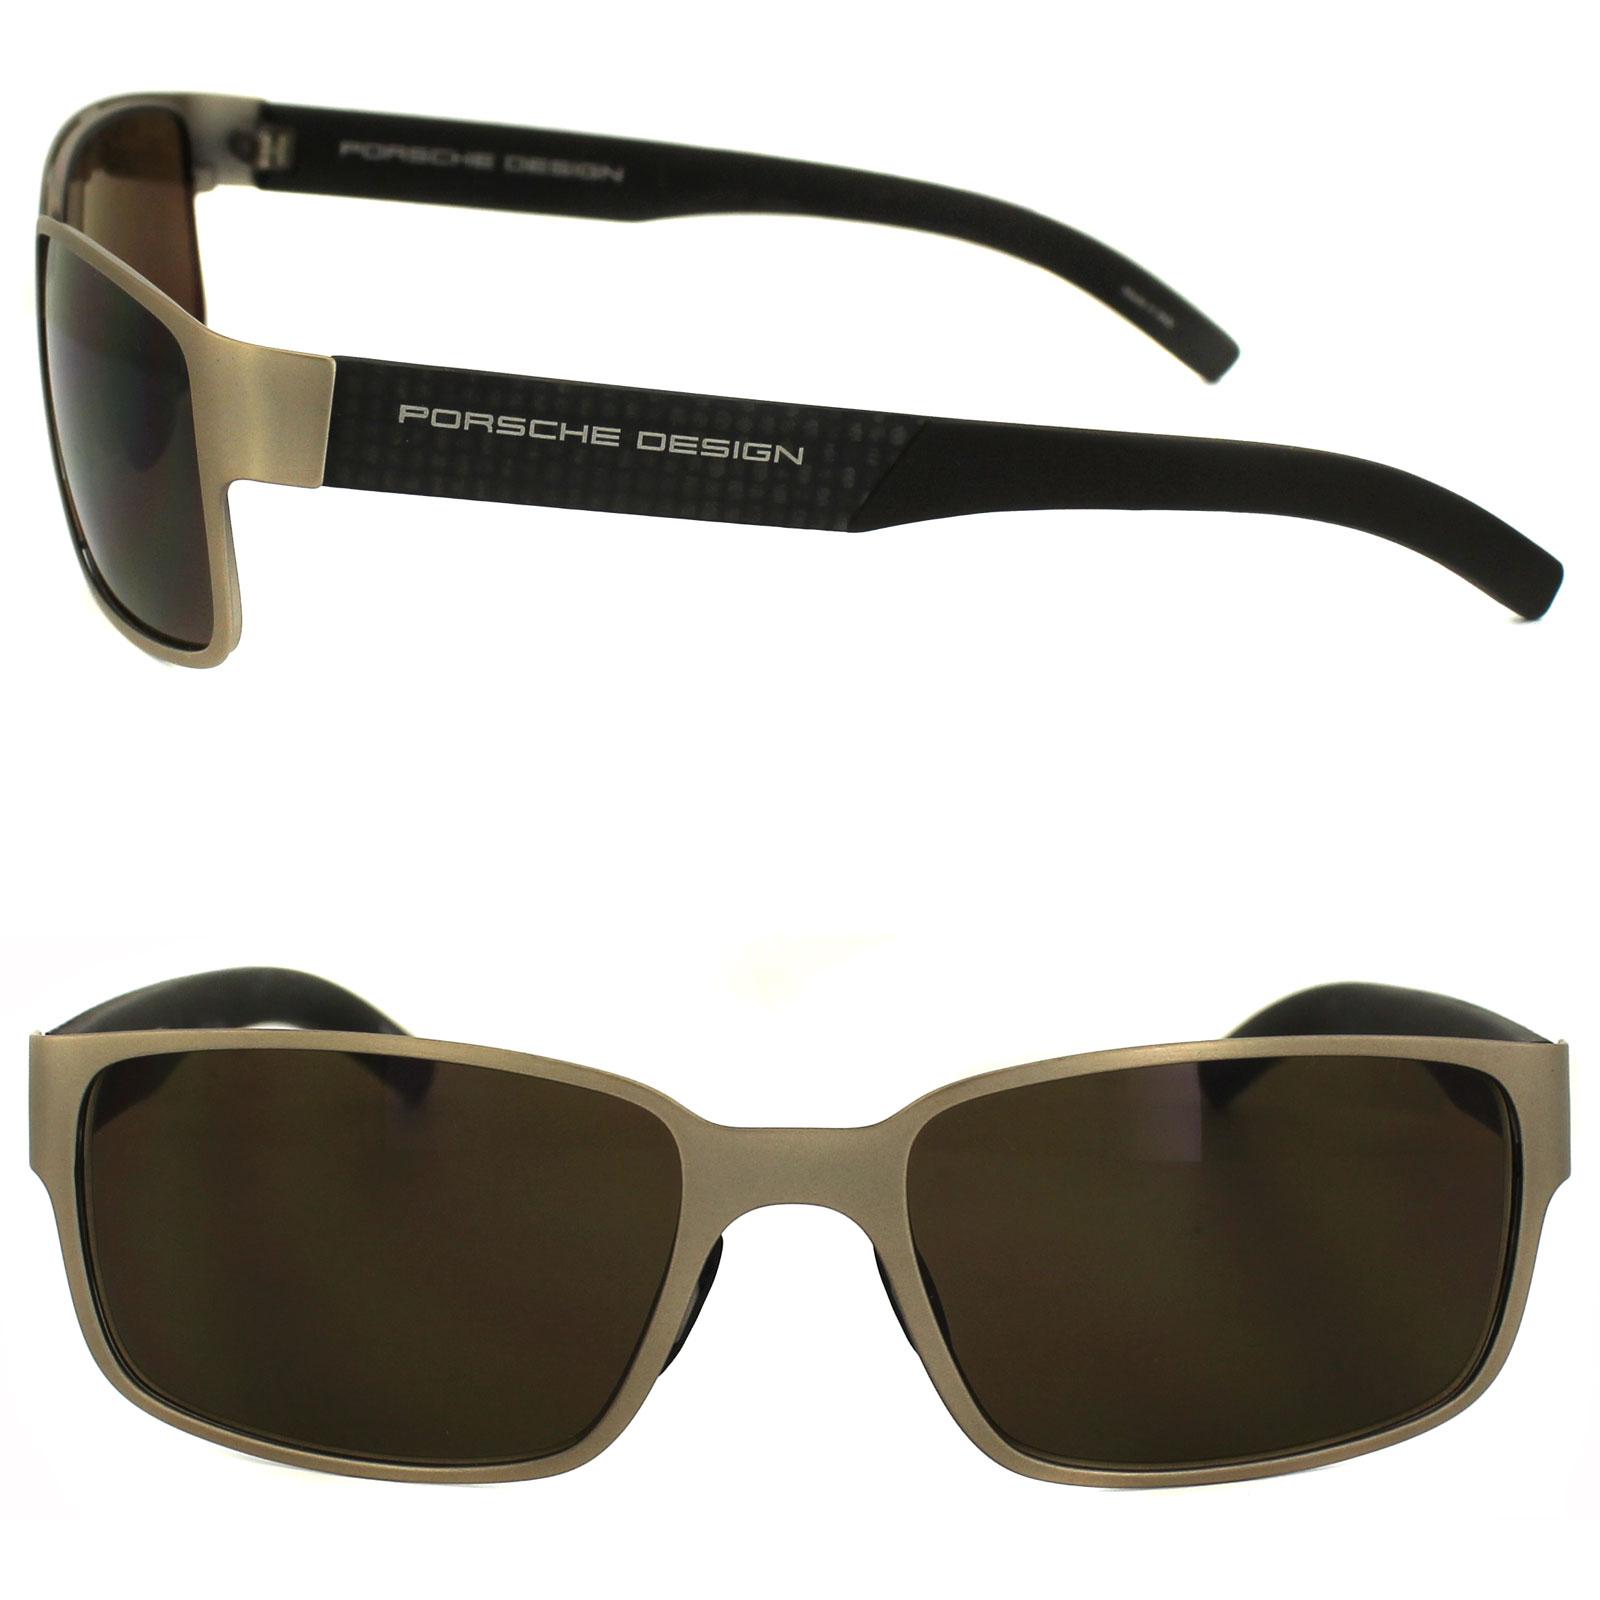 8012735bd6 Porsche Design P8551 Sunglasses Thumbnail 1 Porsche Design P8551 Sunglasses  Thumbnail 2 ...